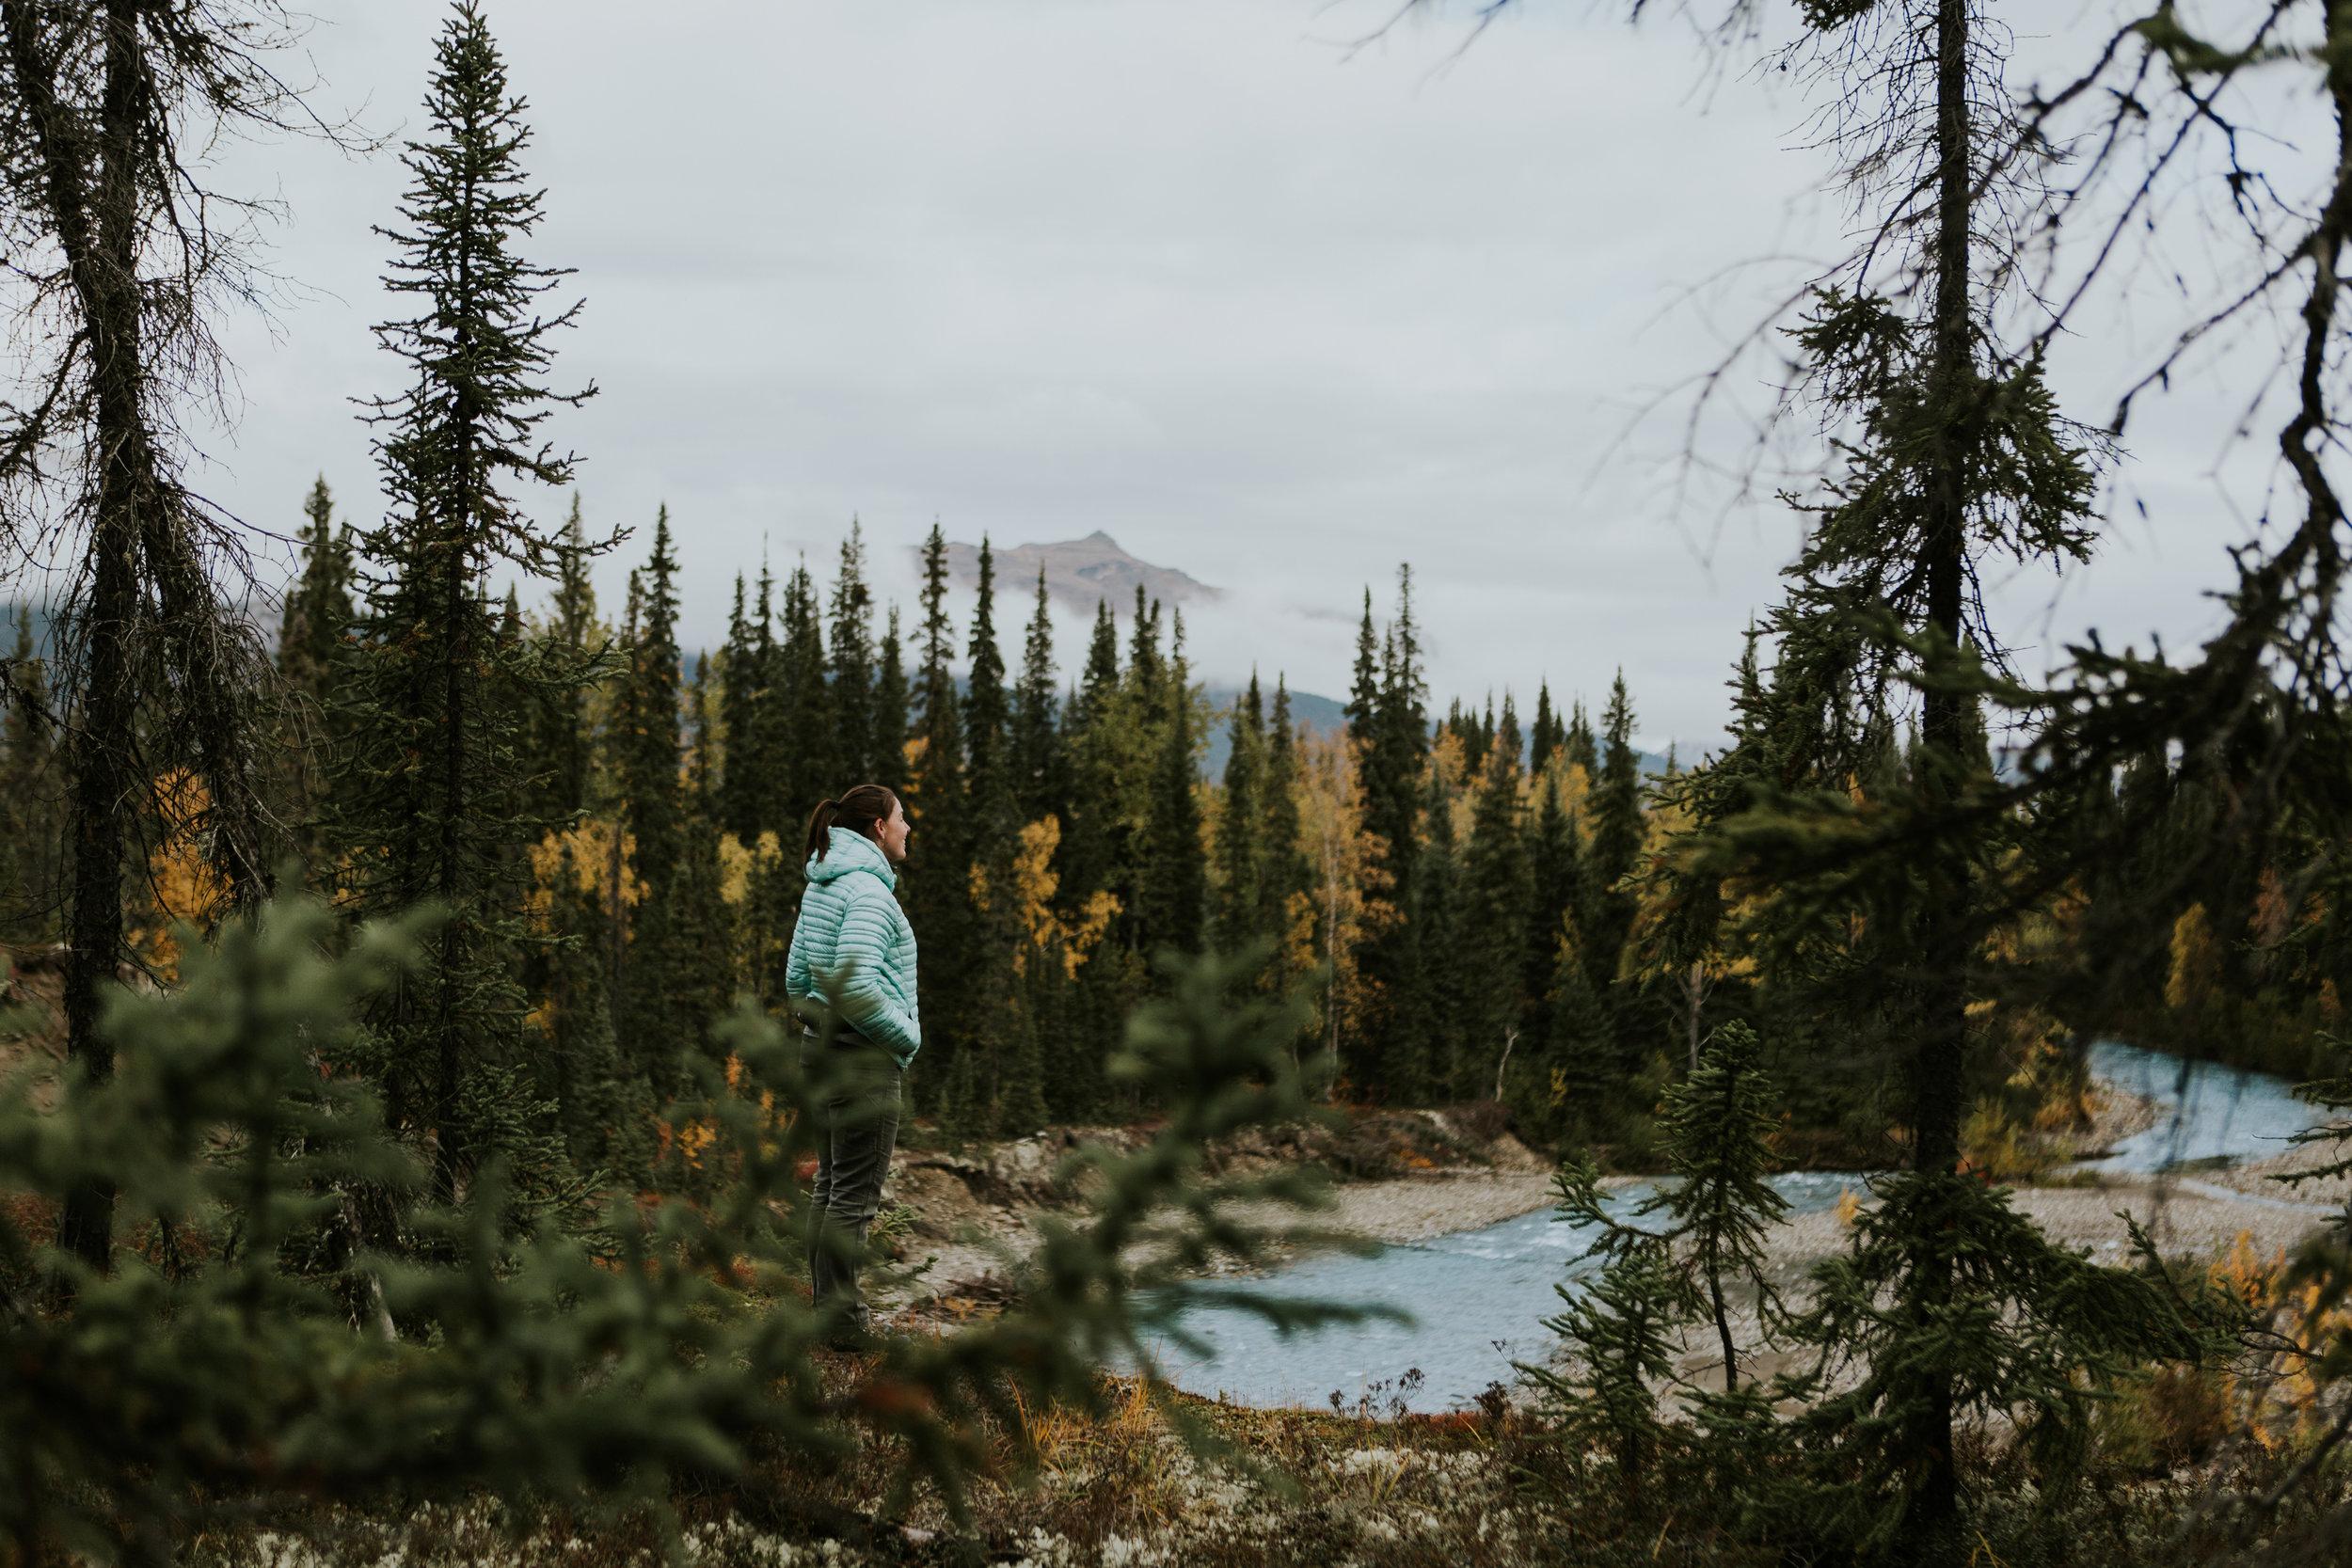 CindyGiovagnoli_Alaska_KoyukukRiver_SukakpakMountain_JimRiver_ArcticCircle_fly_fishing_September-031.jpg